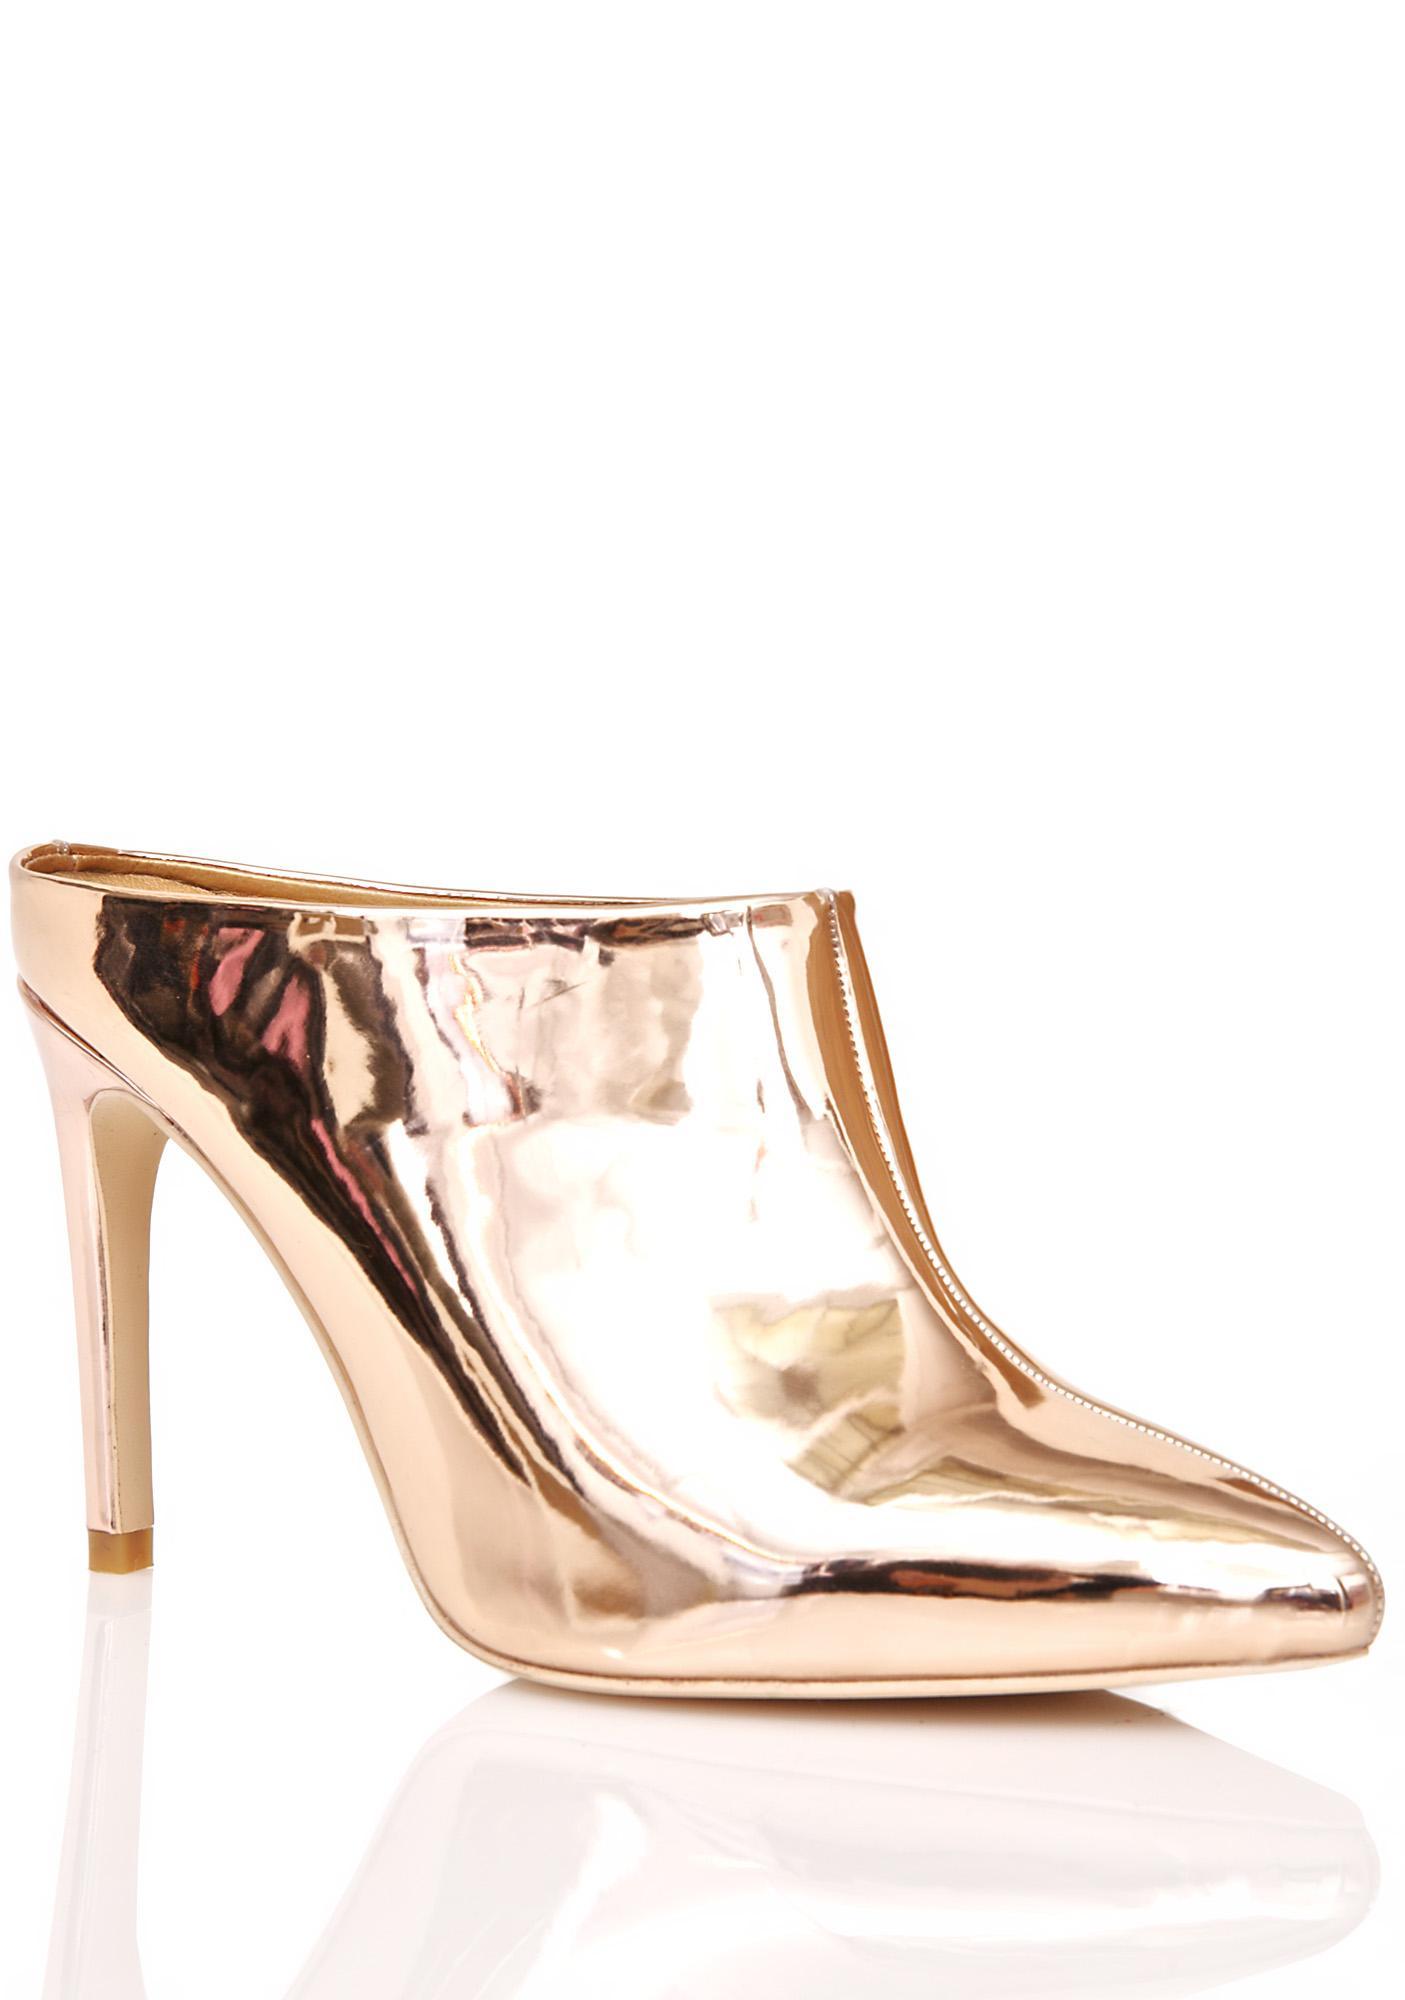 Gilded Glare Metallic Mules